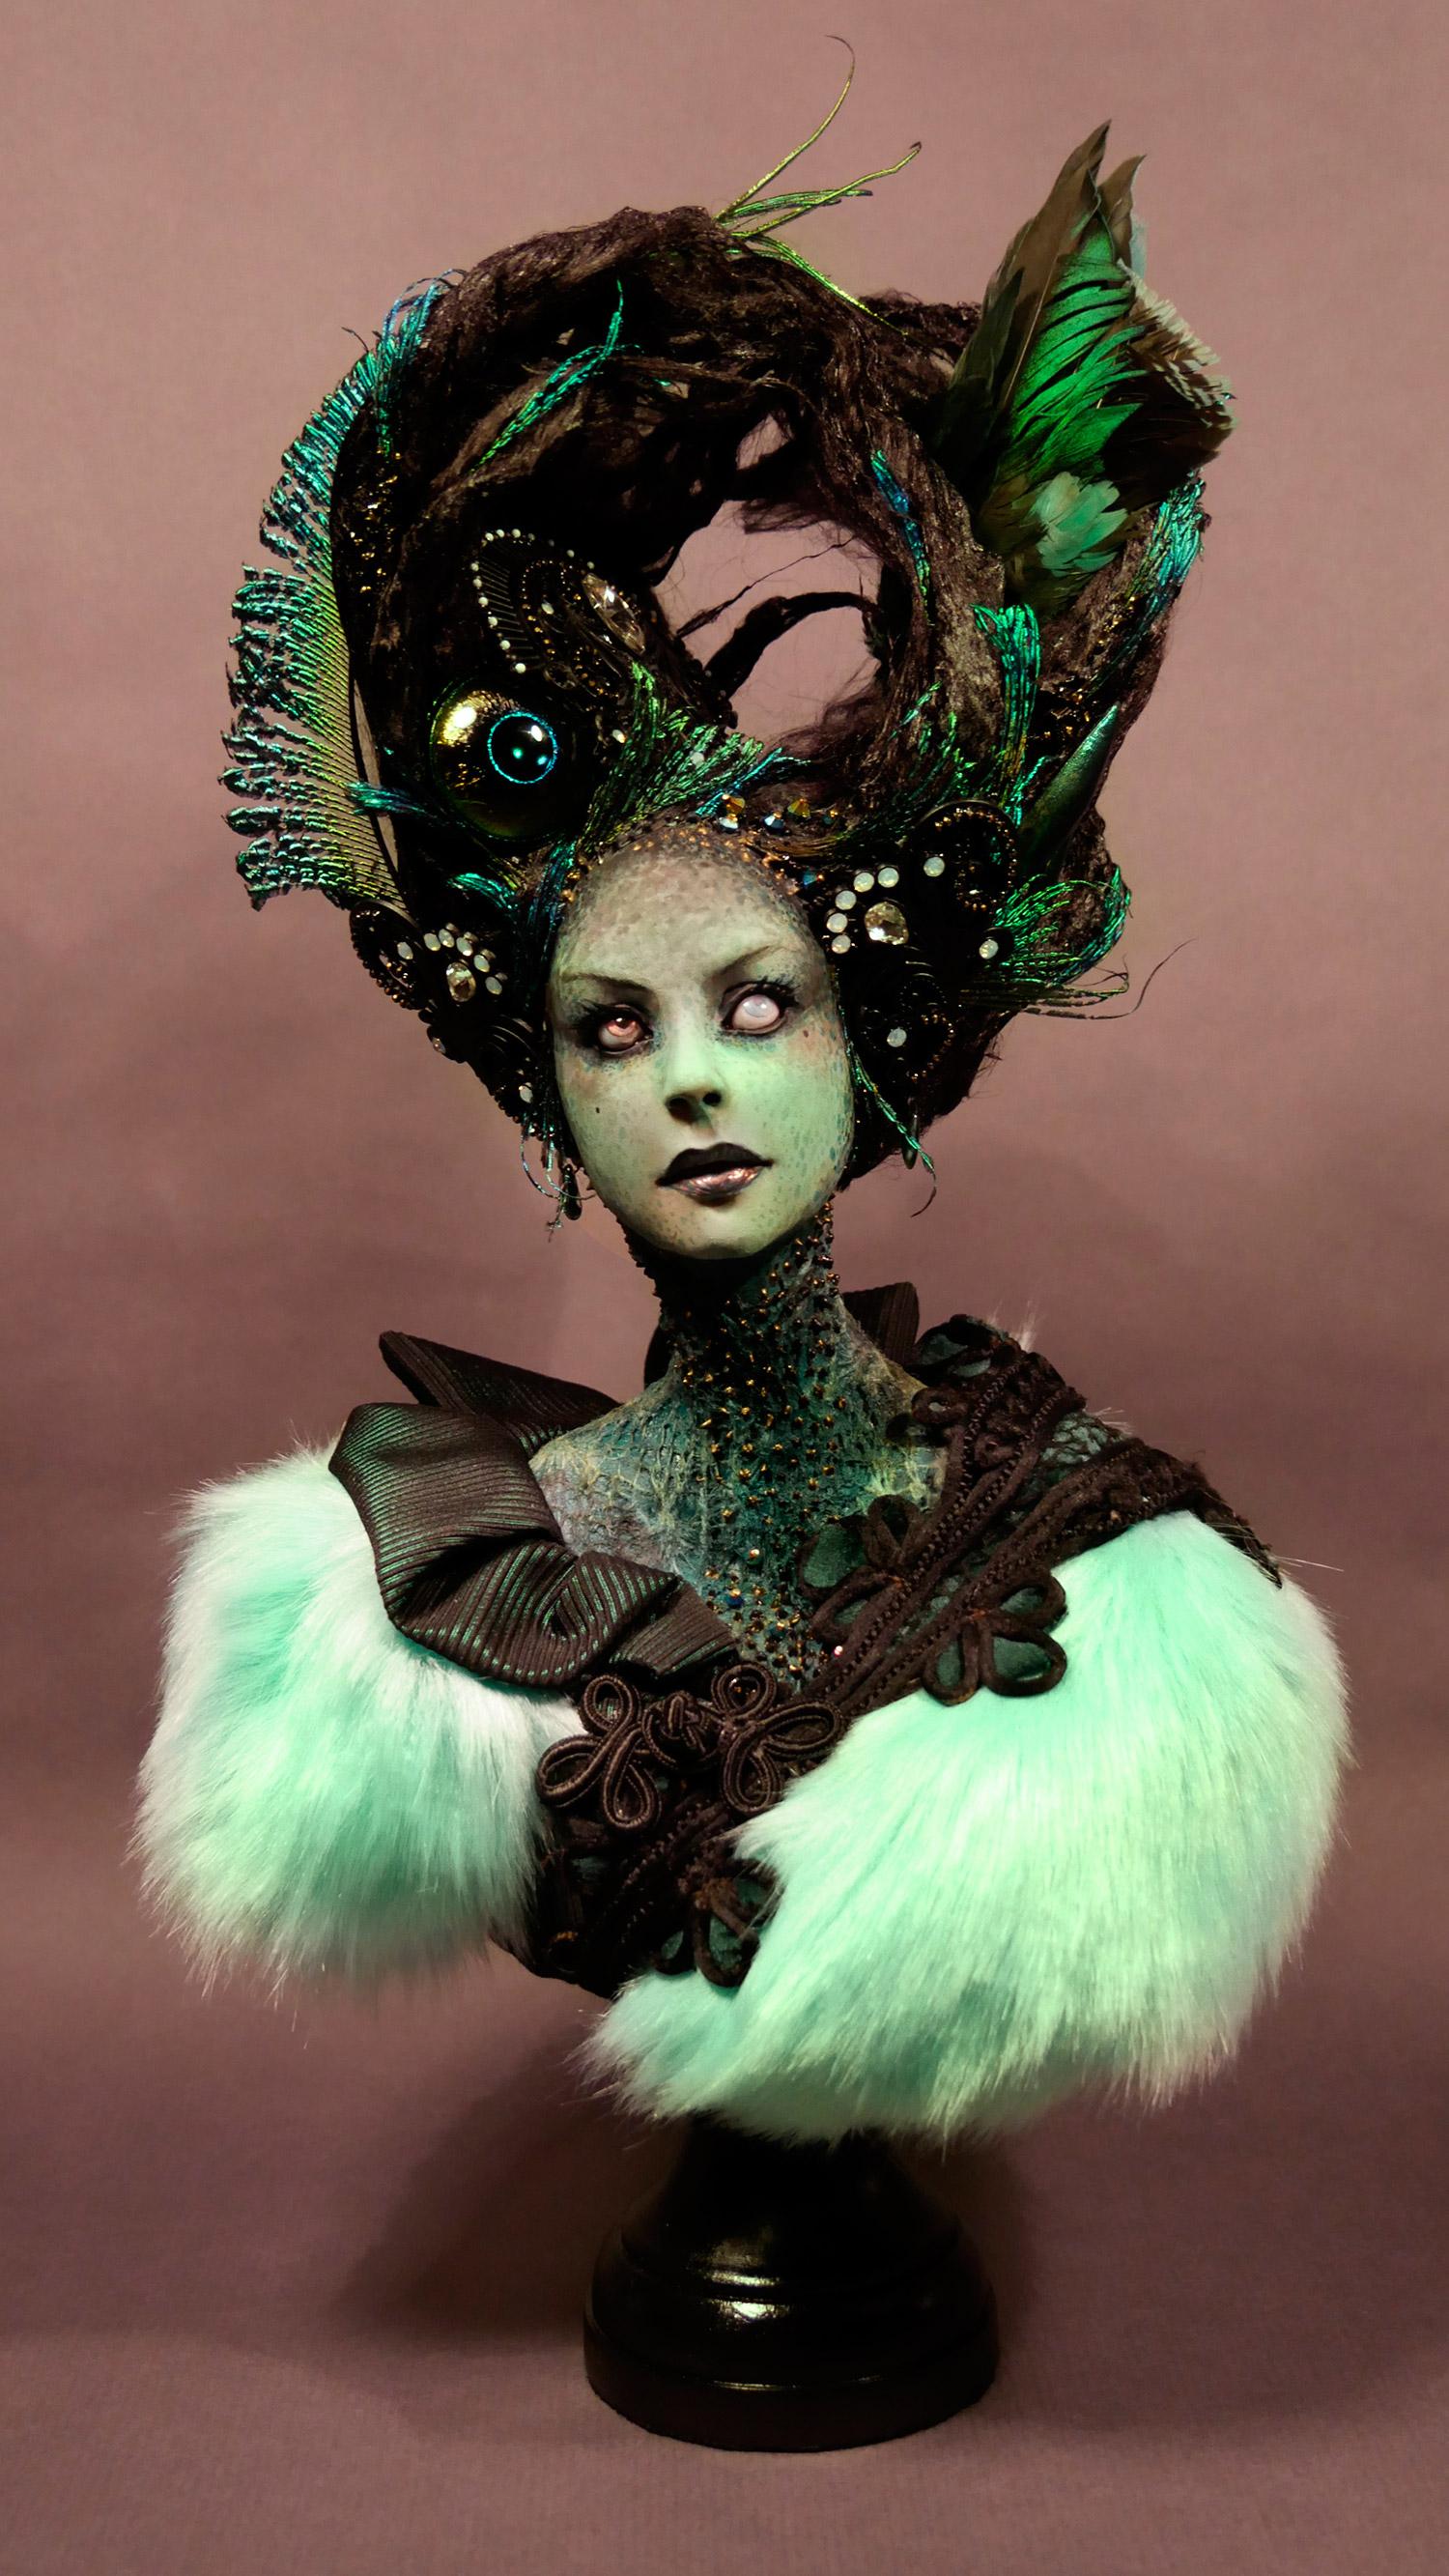 Virginie Ropars - Evil Eye doll sculpture